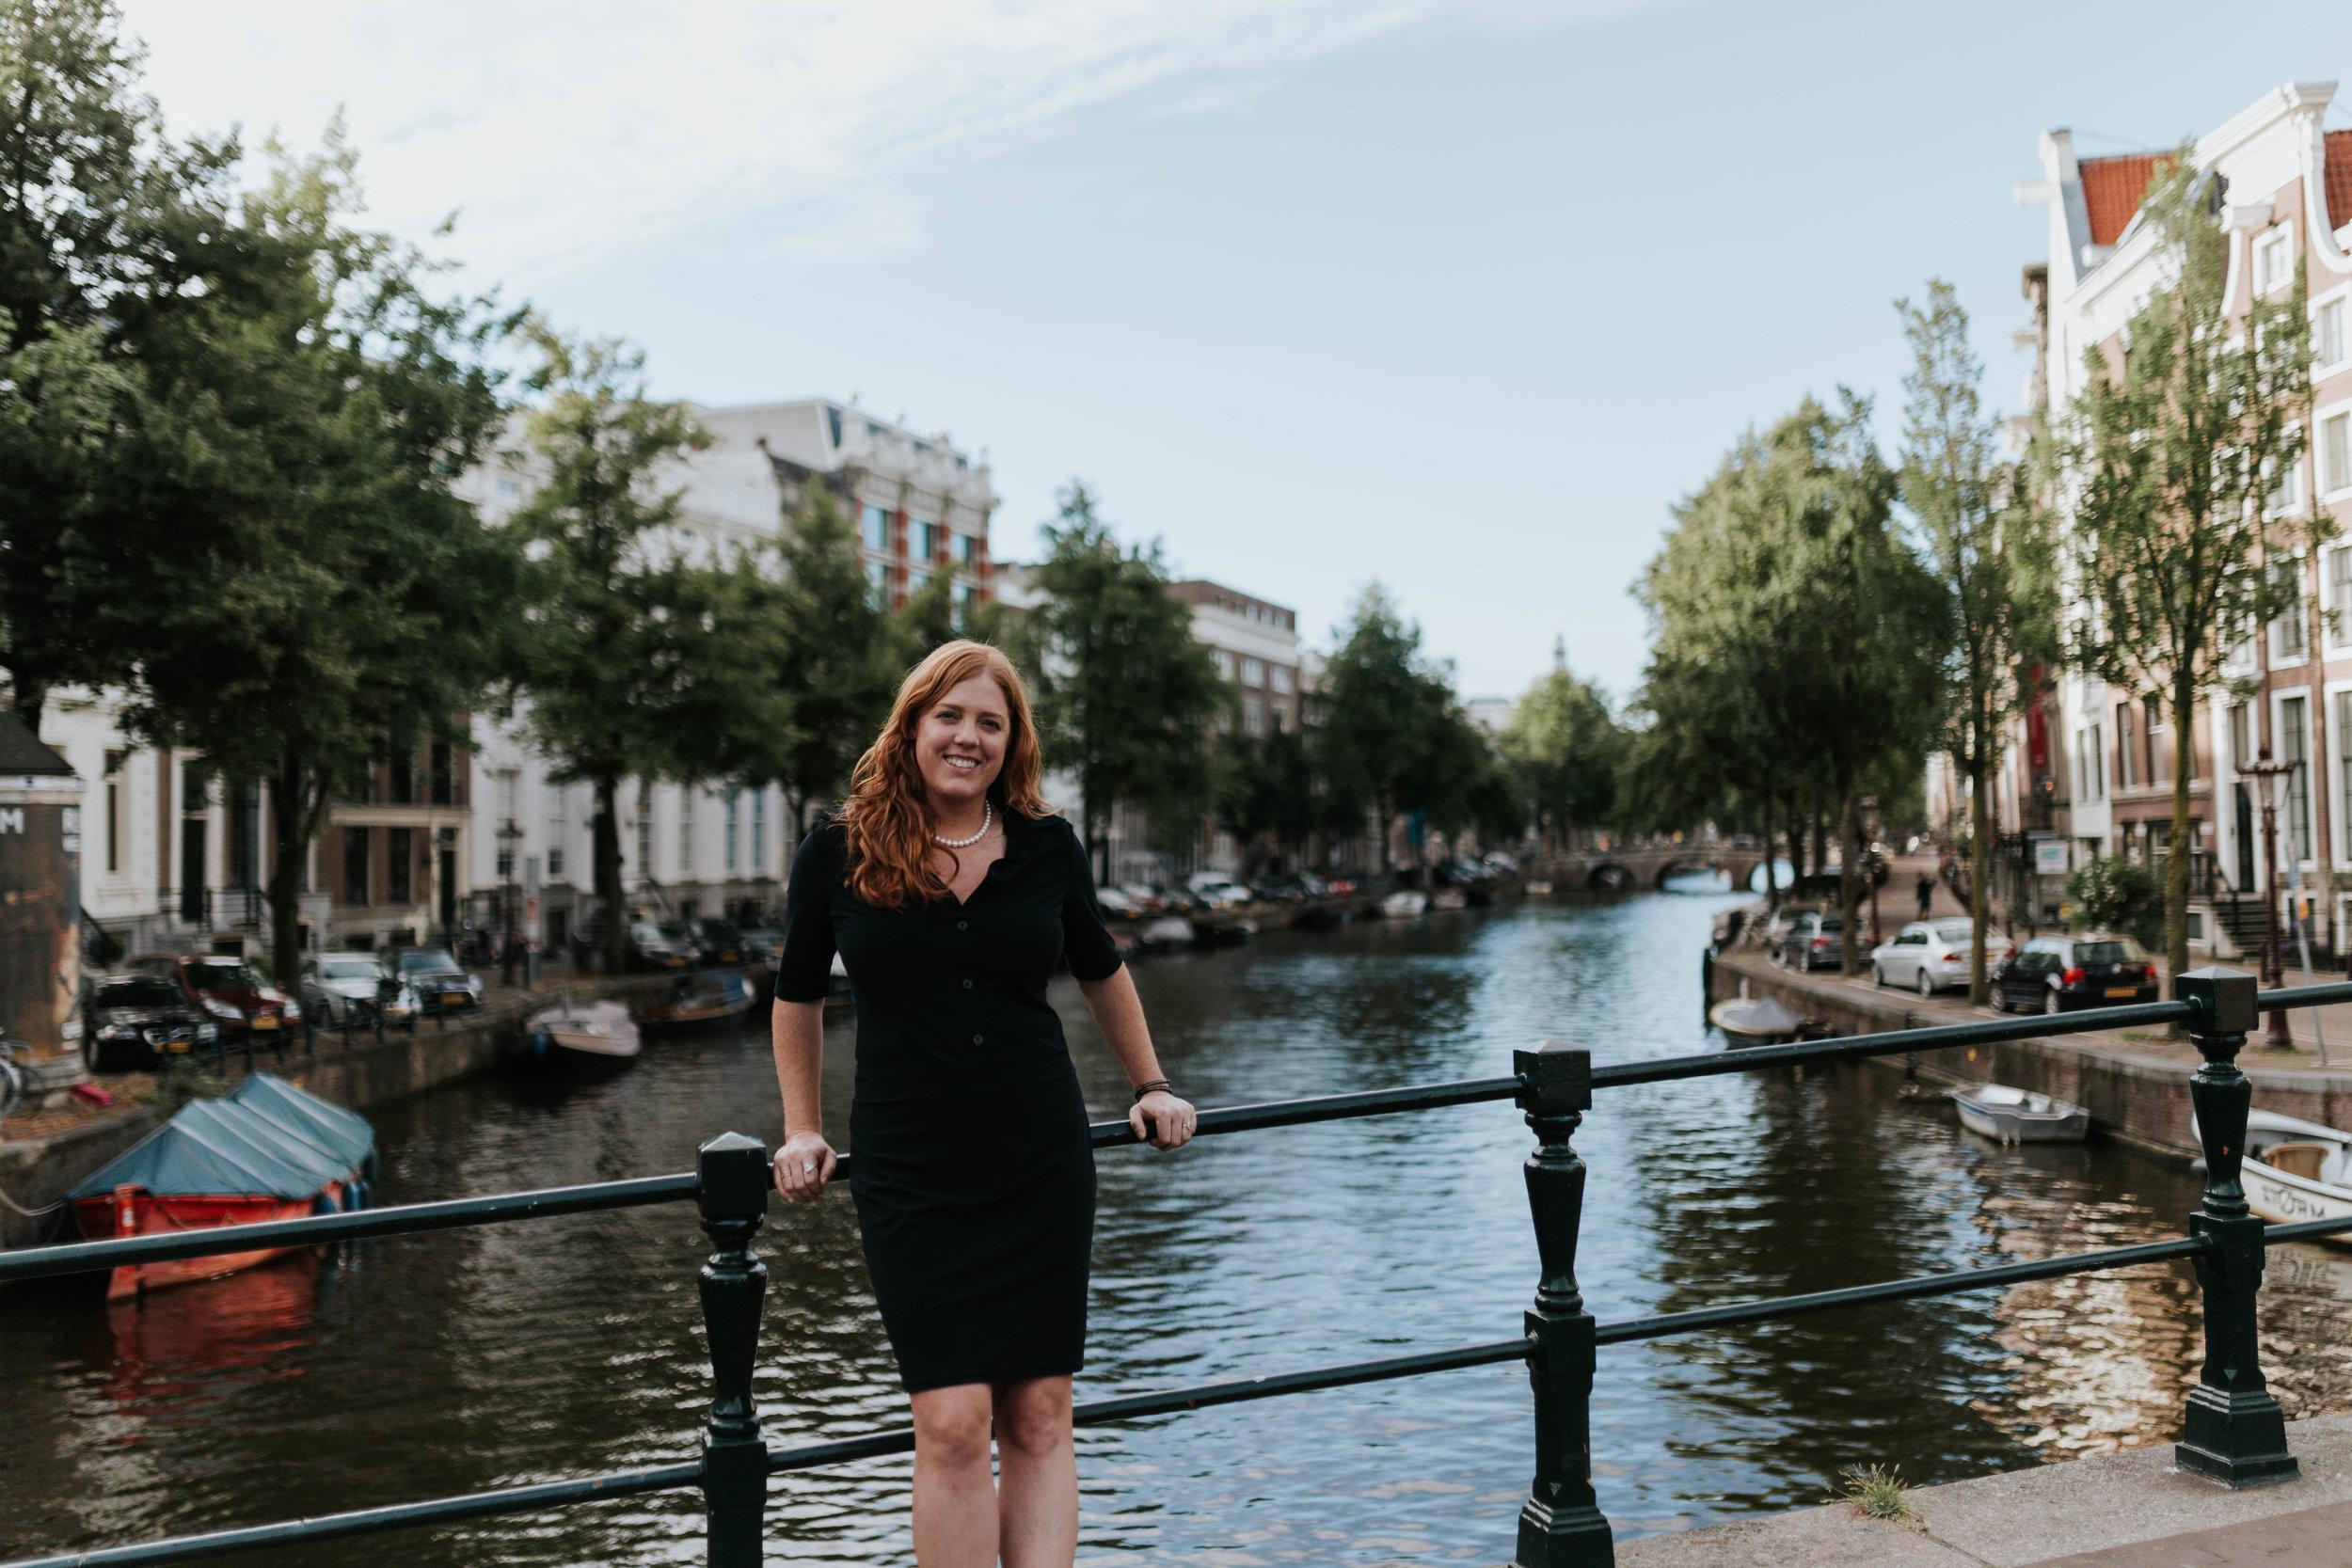 Amsterdam canal shot.jpg